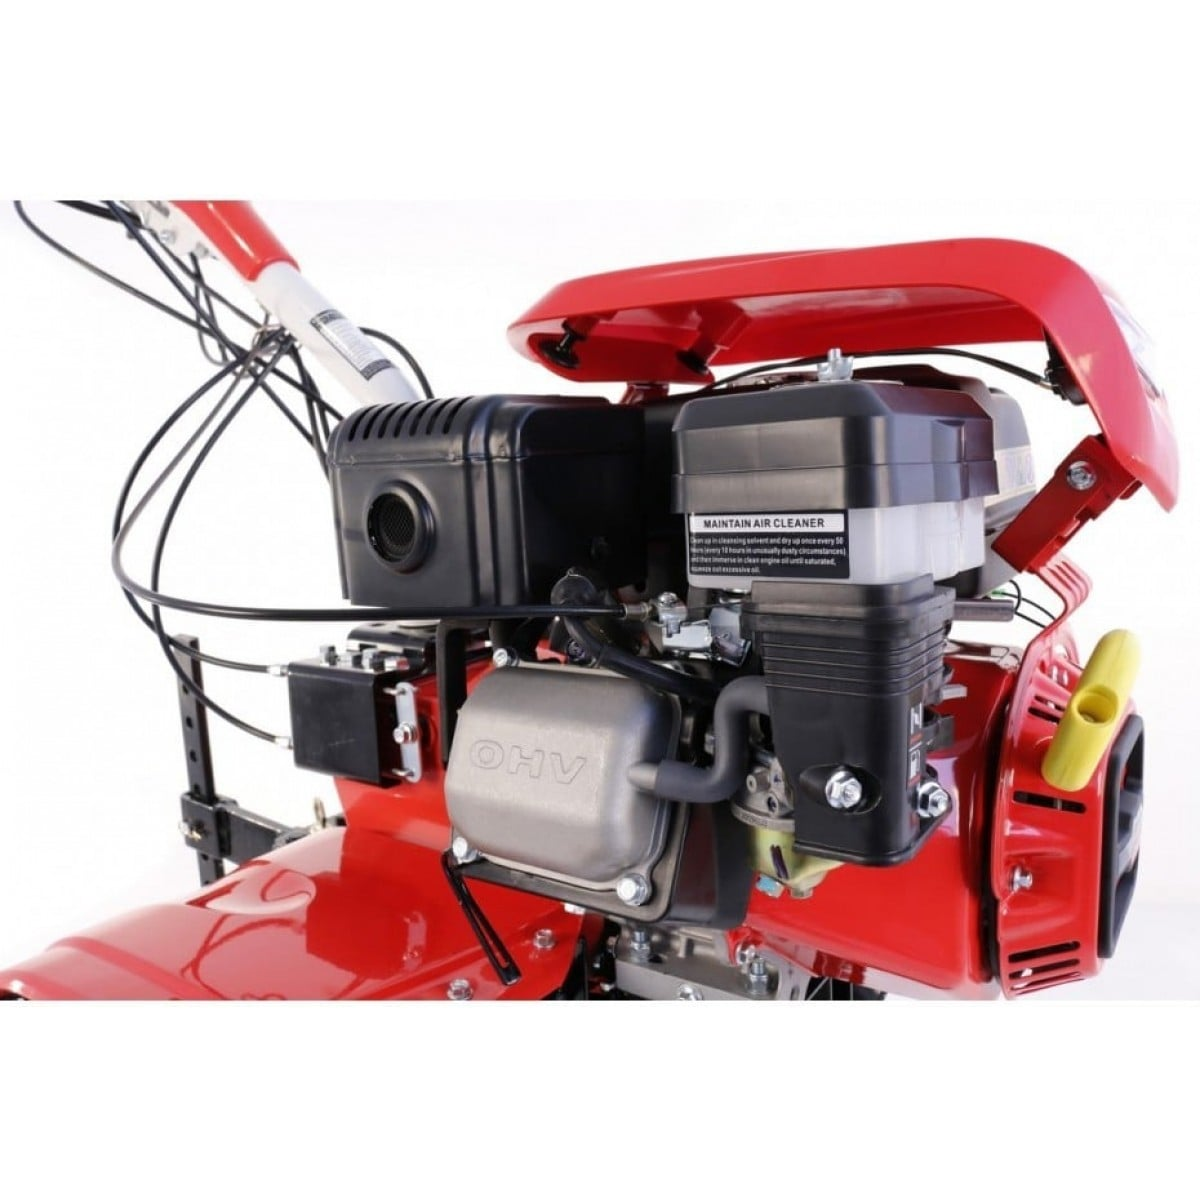 motocultor loncin lc1200 8cp o mac.ro 4 2 79